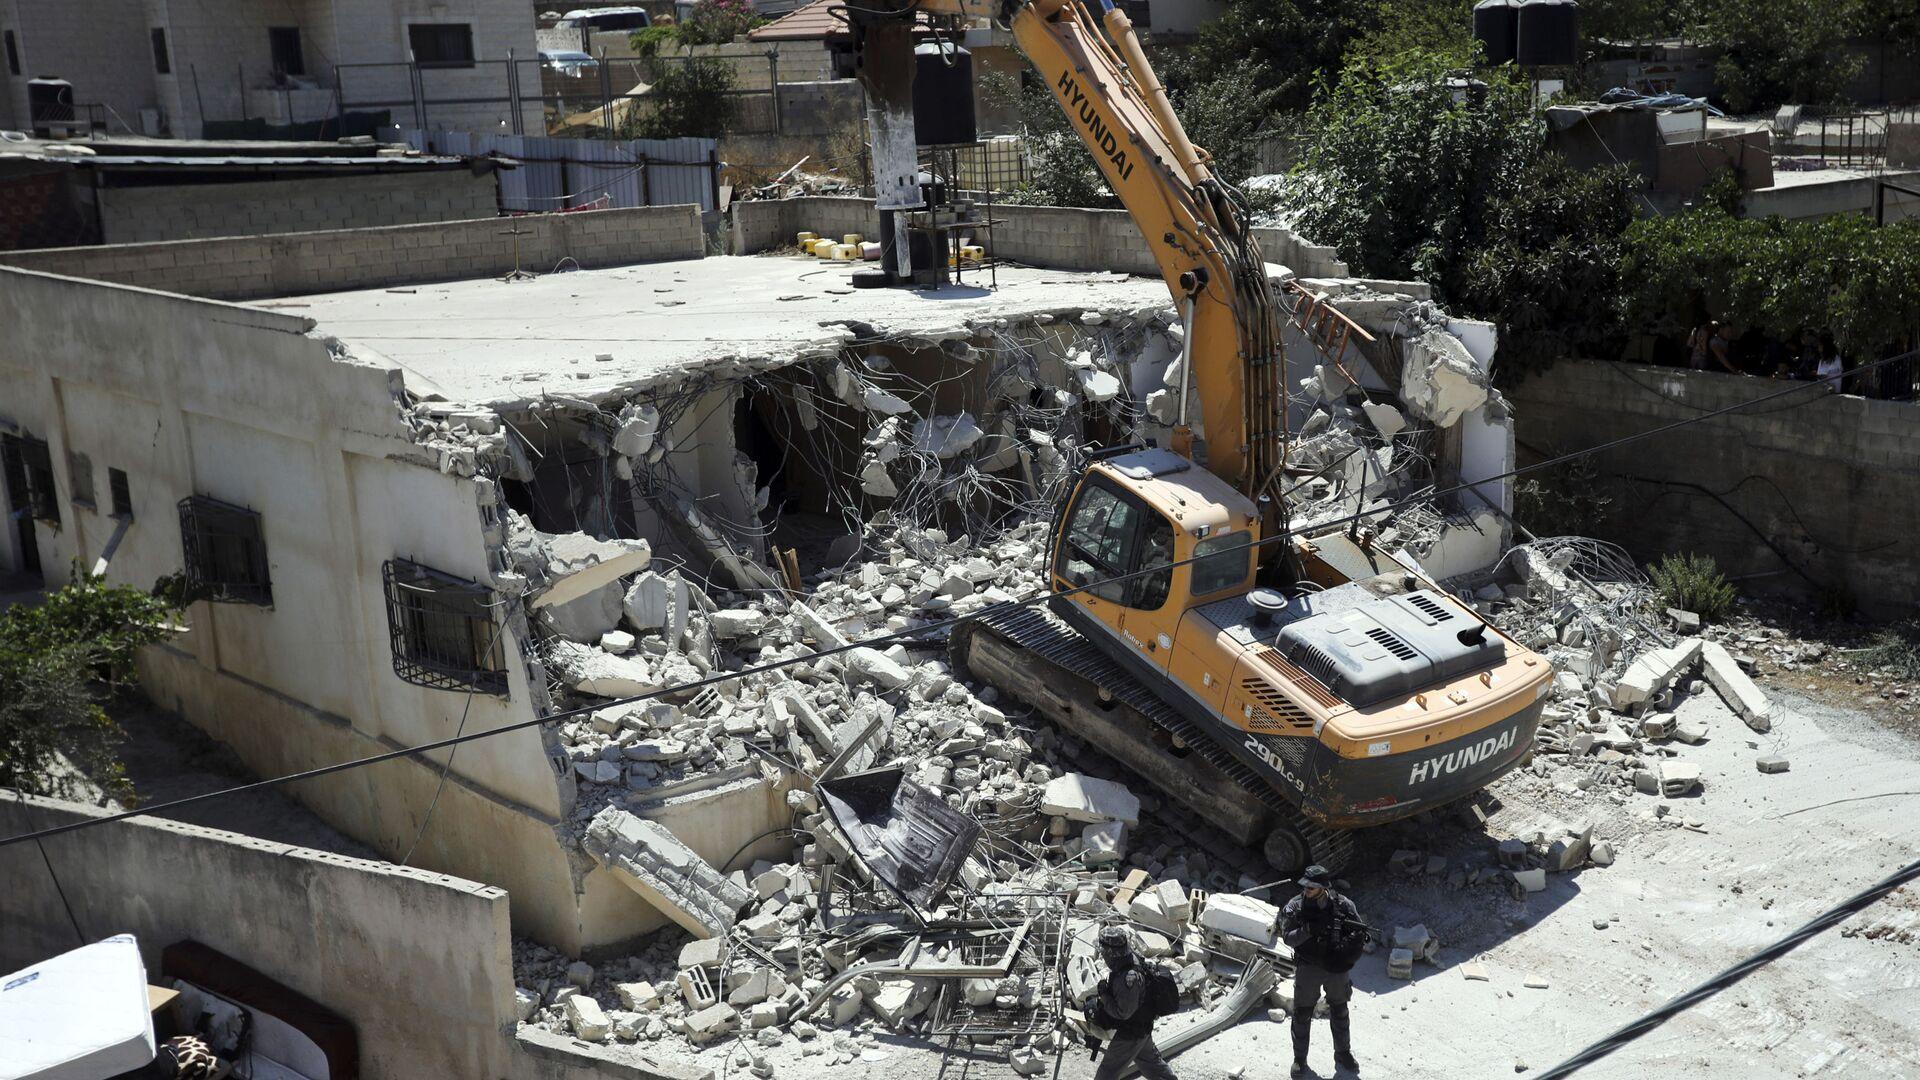 Mezzi israeliani demoliscono una casa di proprietà palestinese a Gerusalemme Est - 21 agosto 2019 - Sputnik Italia, 1920, 29.06.2021